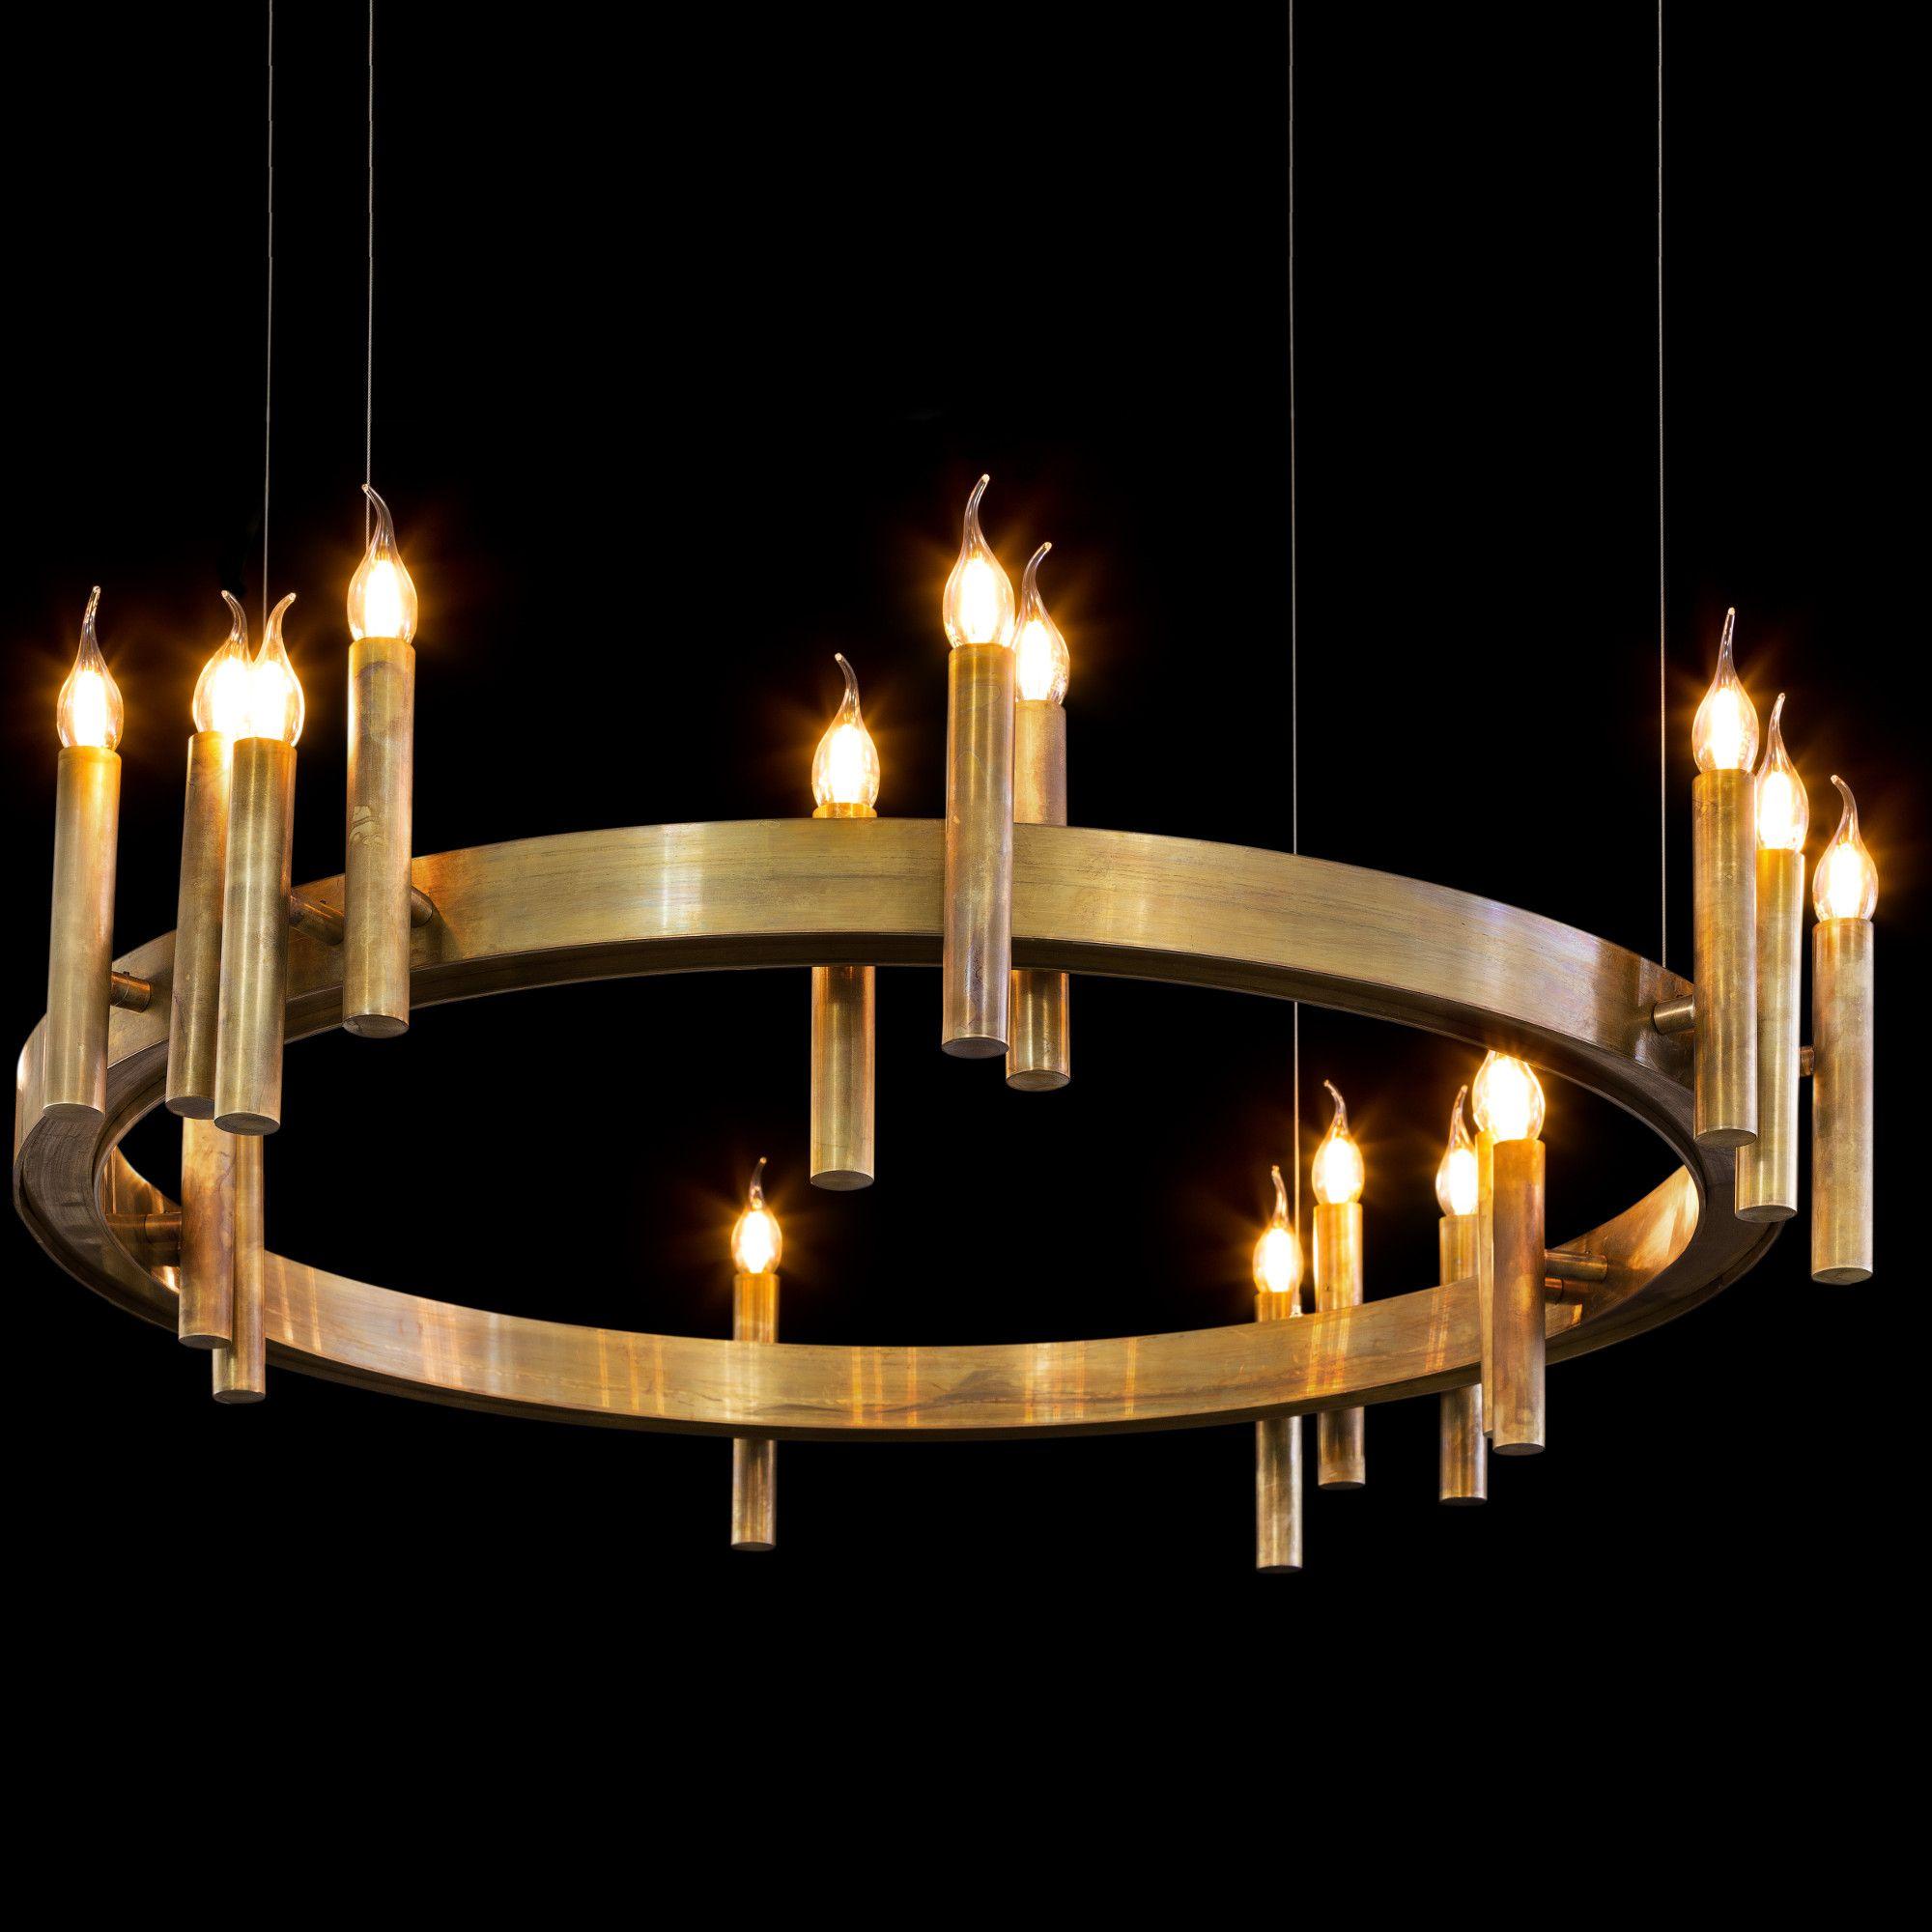 Shiro Ring Chandelier By Brand Van Egmond Shsr100brburu Modern Lighting Design Chandelier Contemporary Chandelier